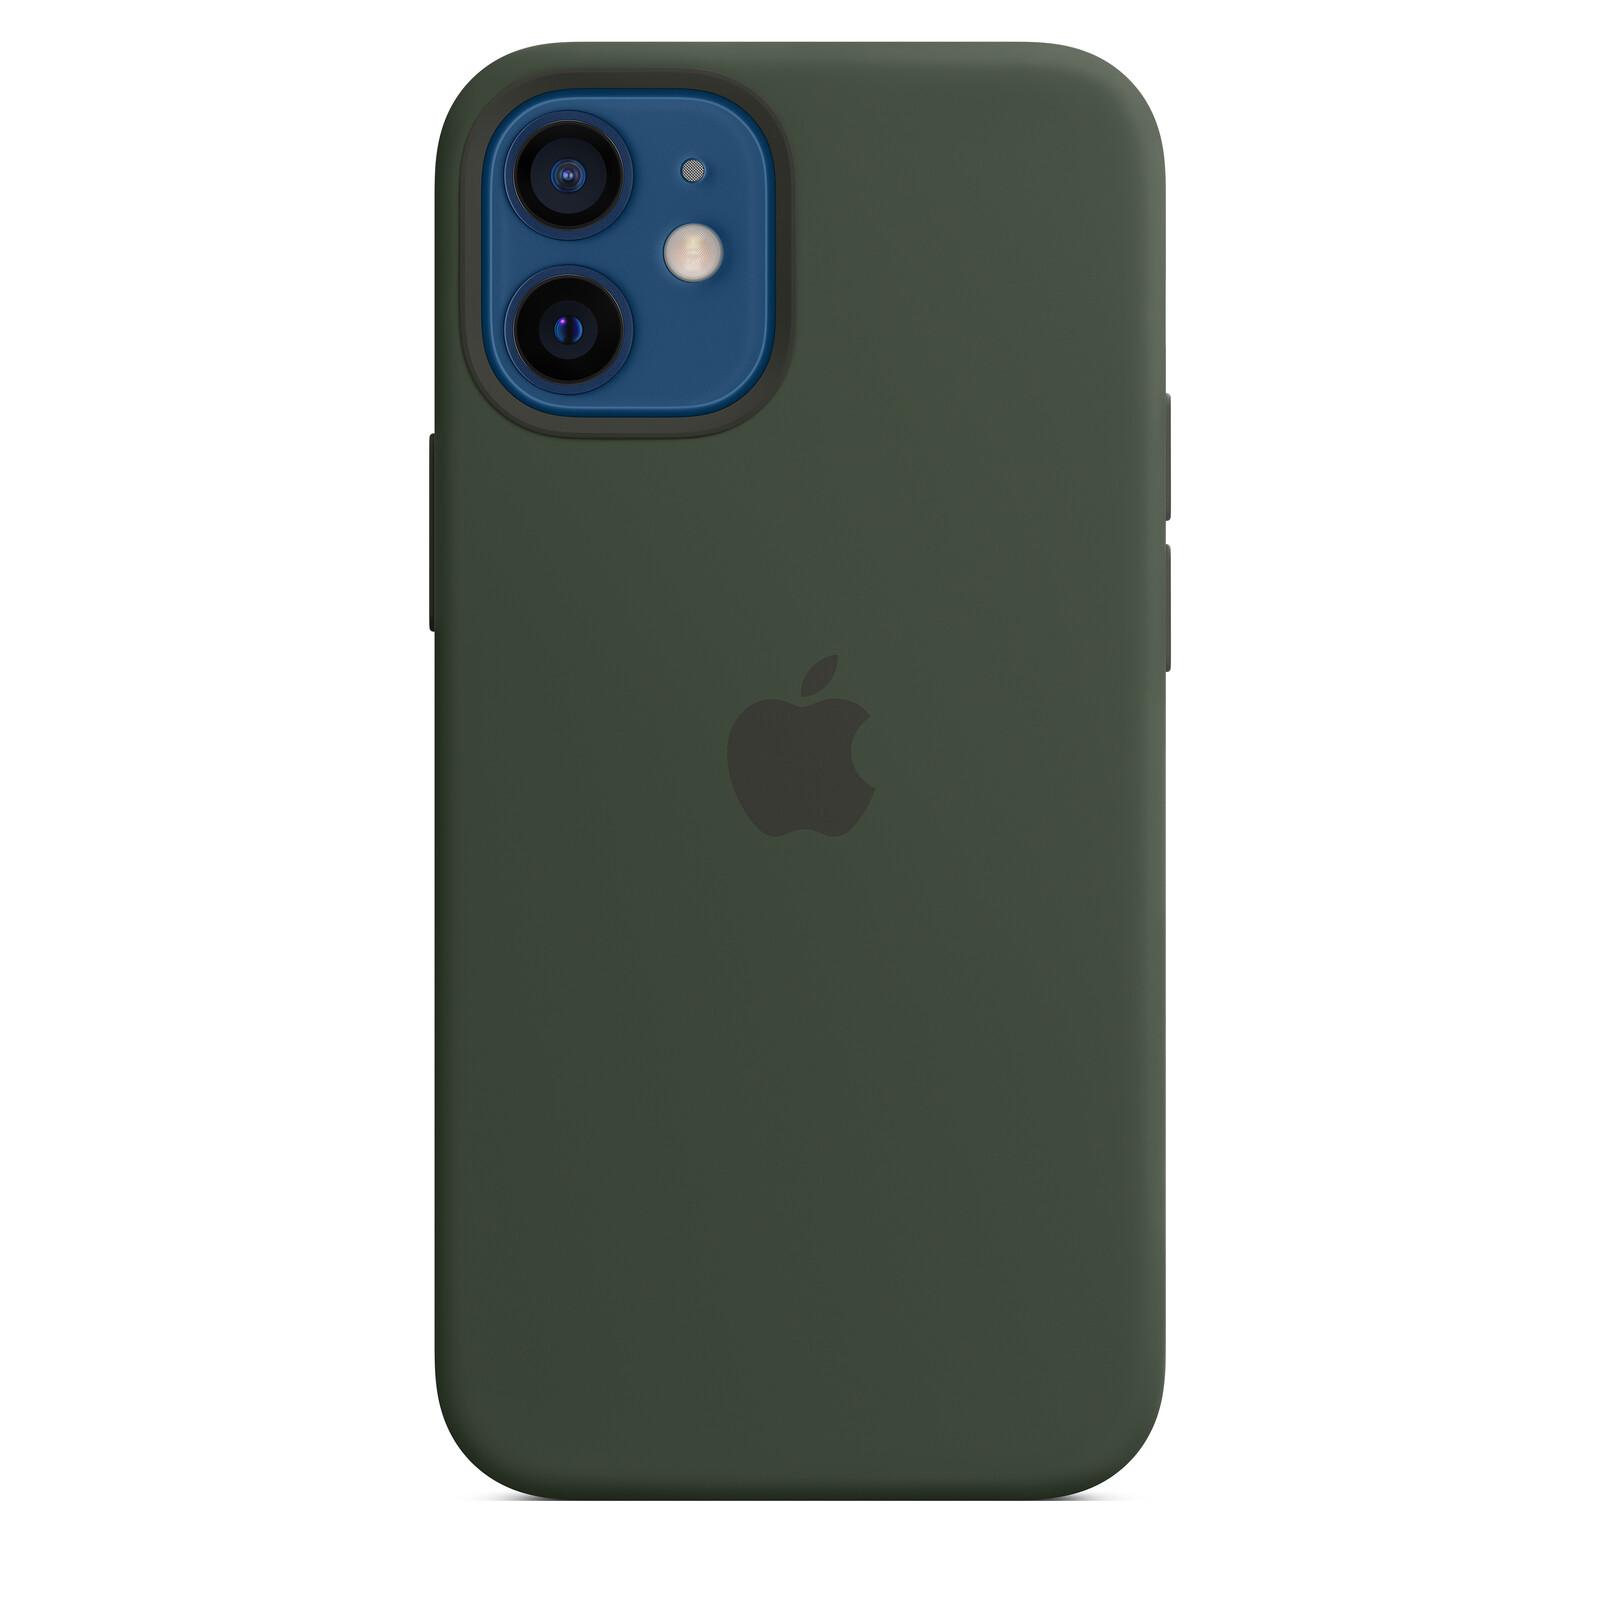 Apple iPhone 12 mini Silikon Case mit MagSafe zyperngrün